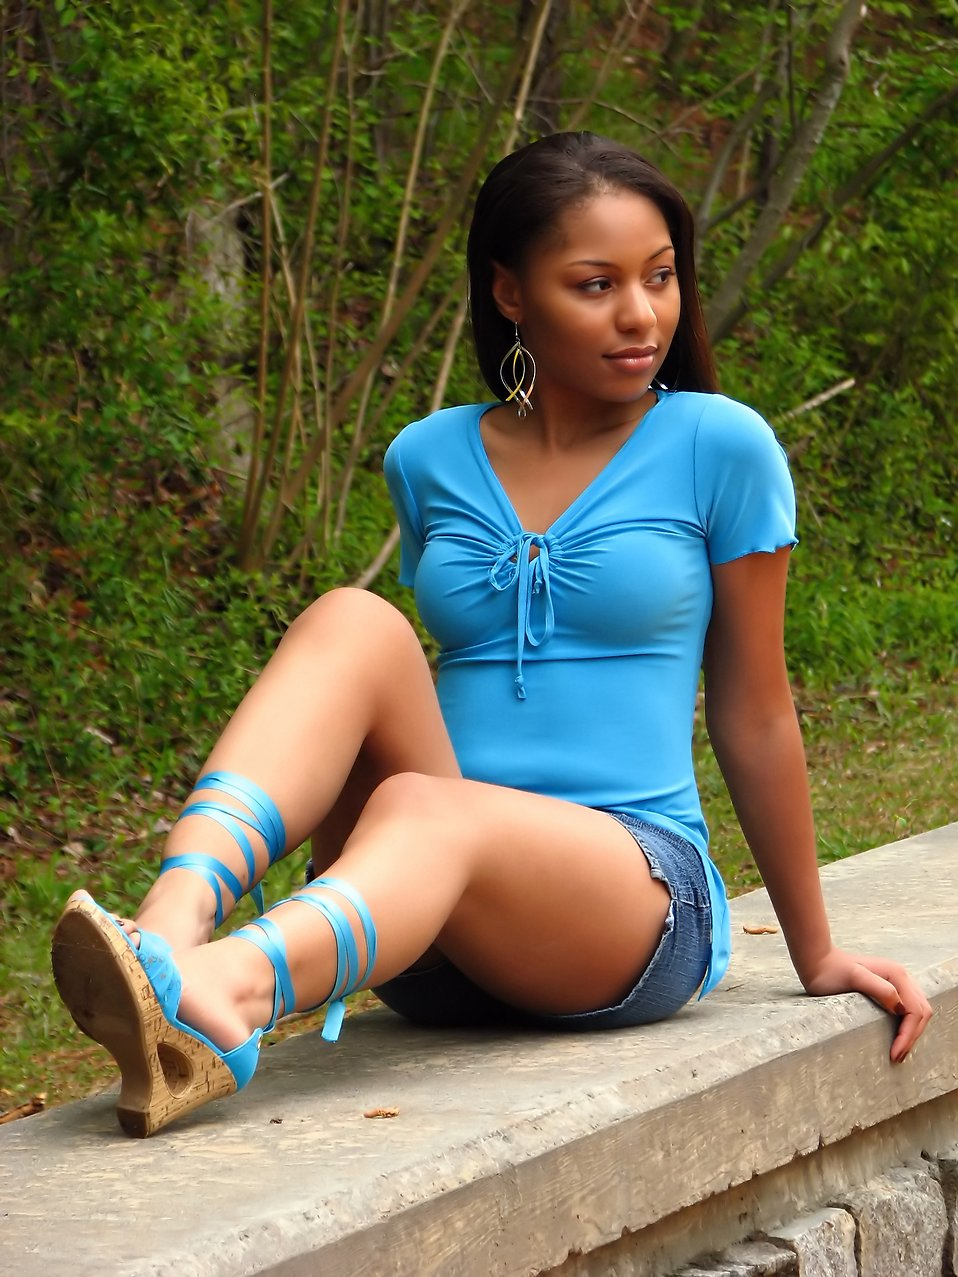 Teen Sites Atlanta Teens Afro 92